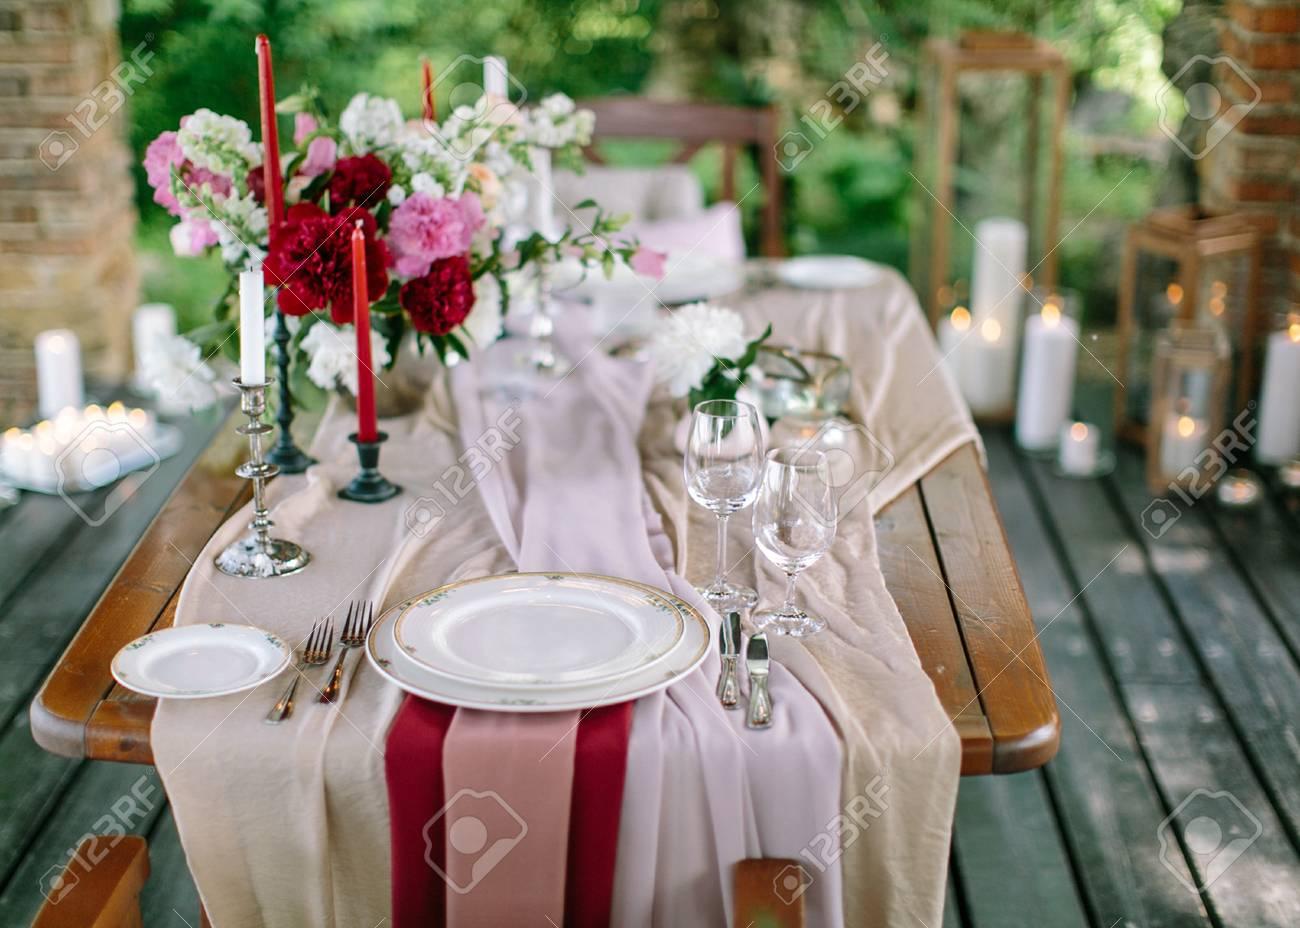 Festive Table Setting. Wedding Decor. Table Setting In Classic ...